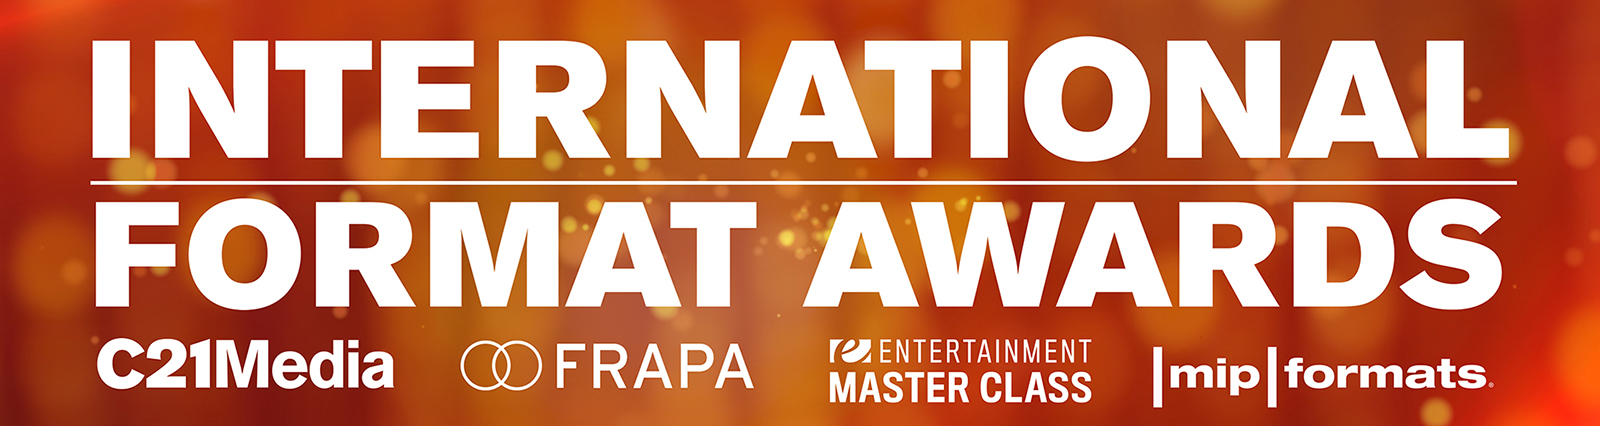 Format Awards banner